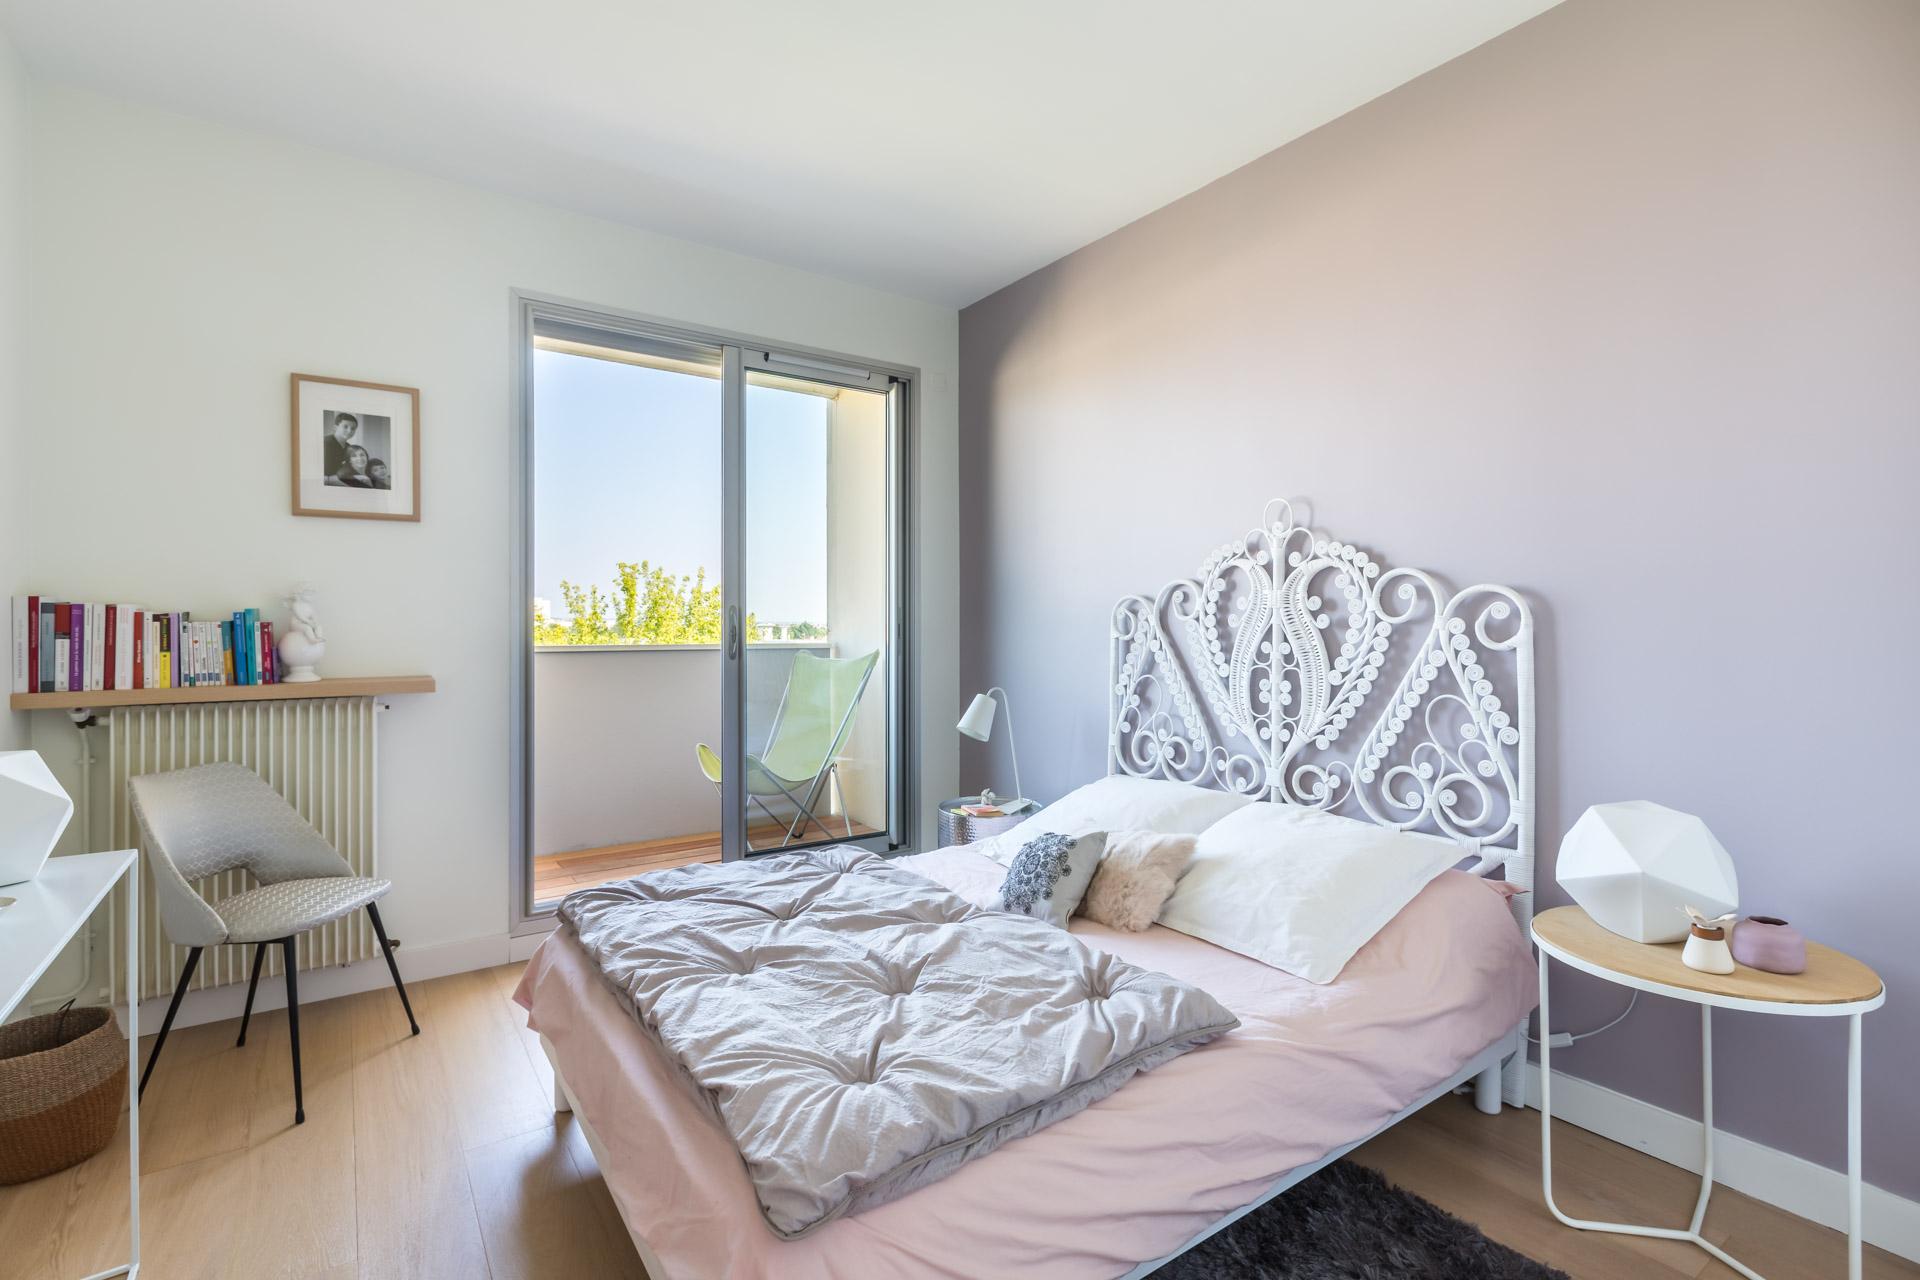 Однокомнатная квартира 40 кв м спальня